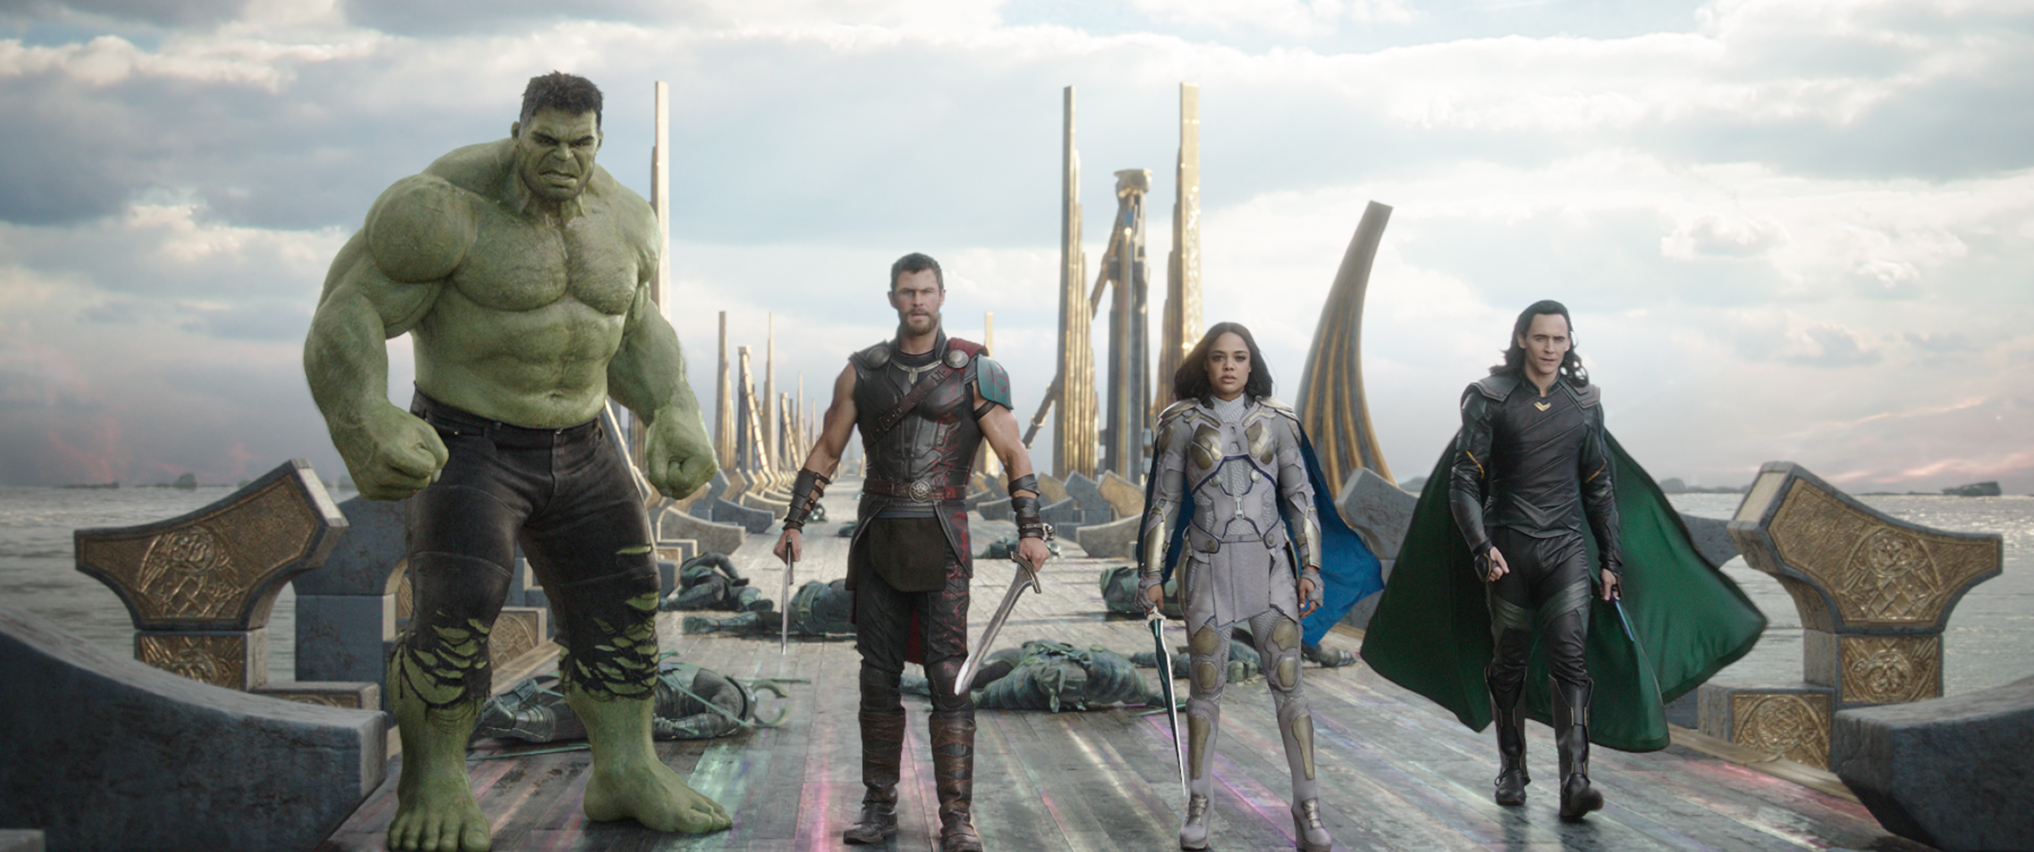 THOR: RAGNAROK..L to R: Hulk (Mark Ruffalo), Thor (Chris Hemsworth), Valkyrie (Tessa Thompson) and Loki (Tom Hiddleston)